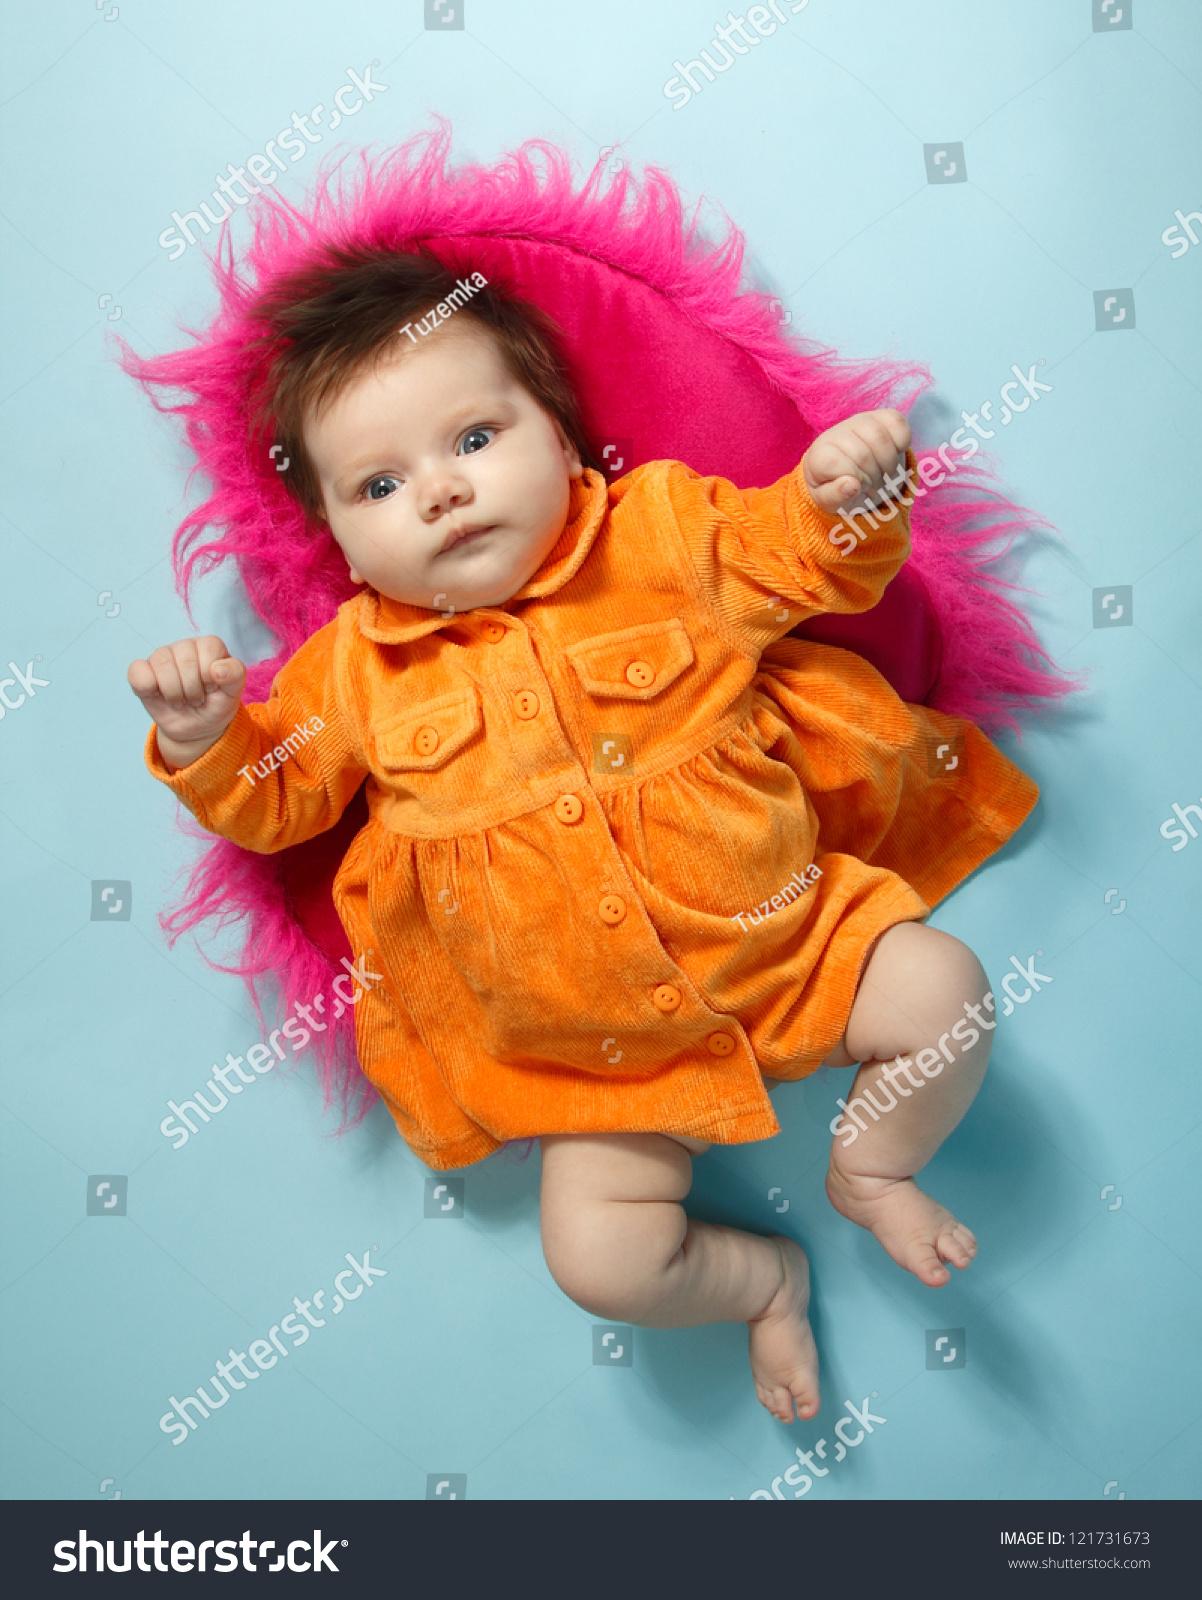 cute baby girl in orange dress